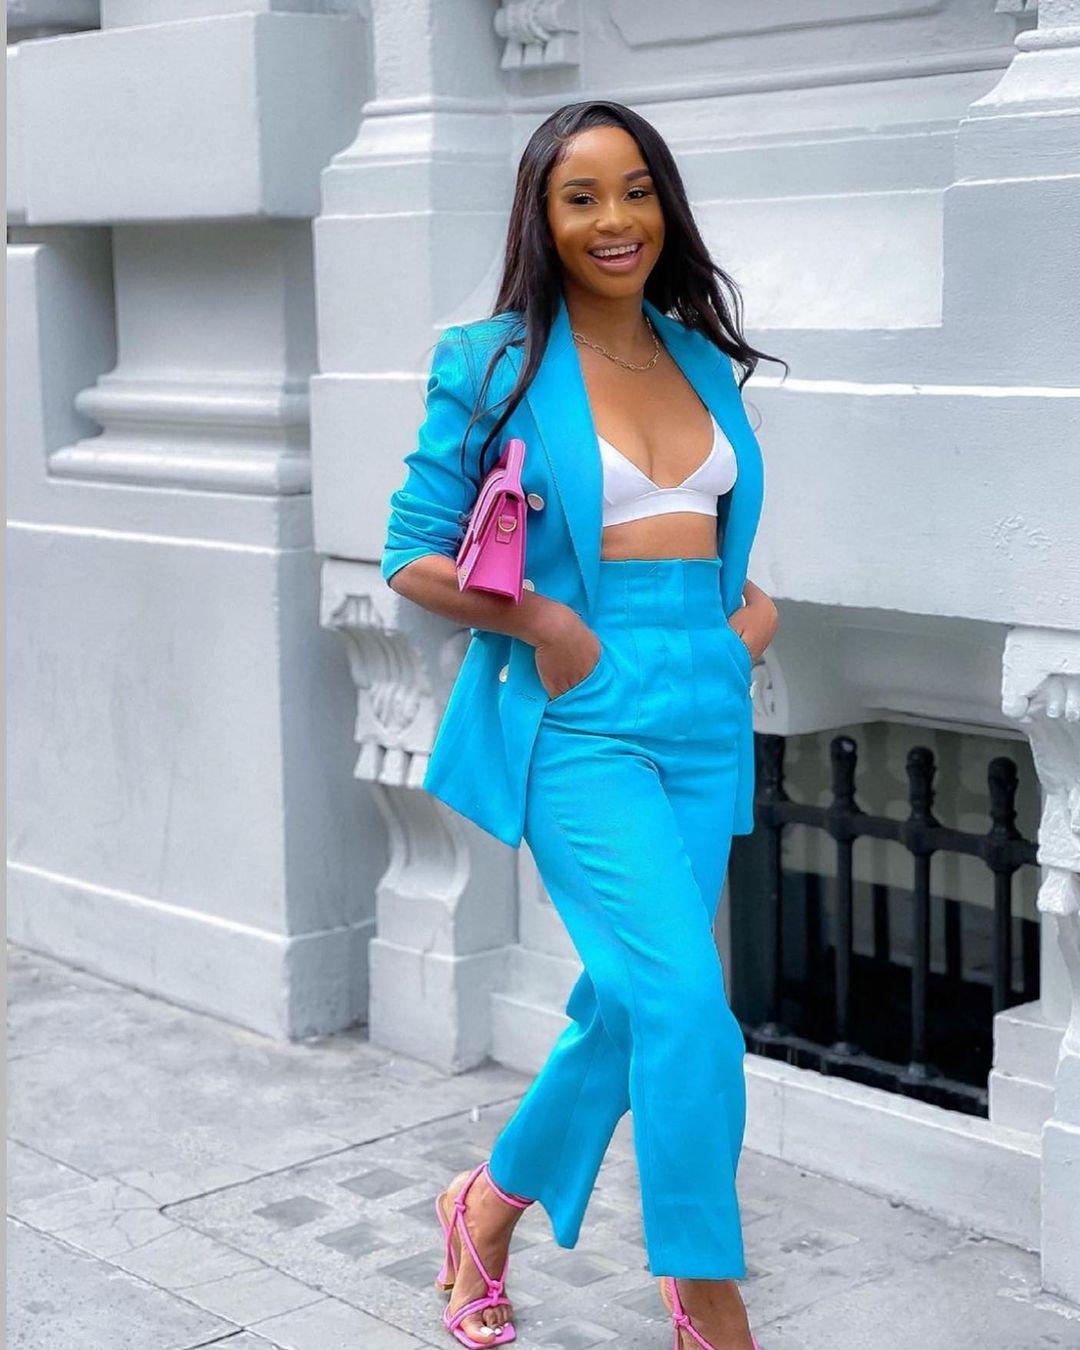 criss-breasted jacket with pockets de Zara sur zara.style.daily